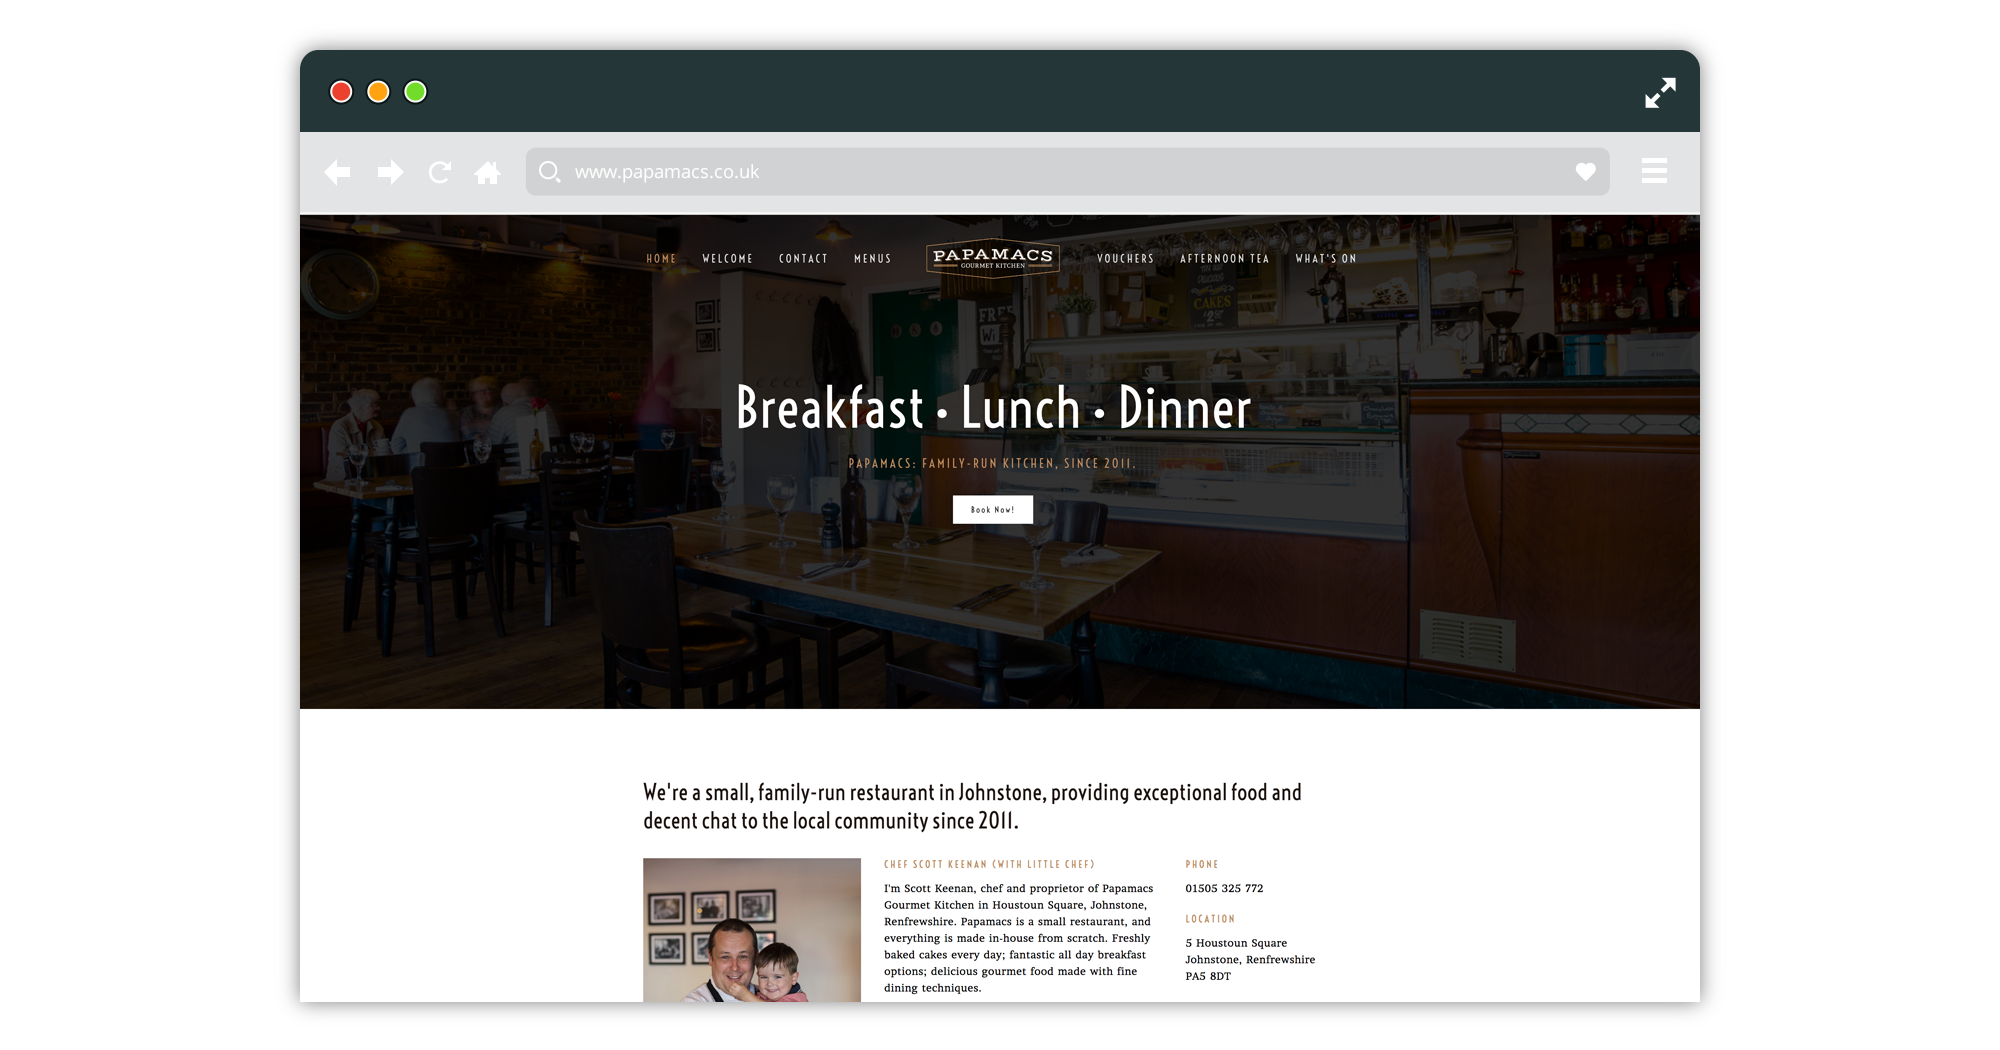 restaurant-web-design-glasgow-papamacs-johnstone-graphic-1.png